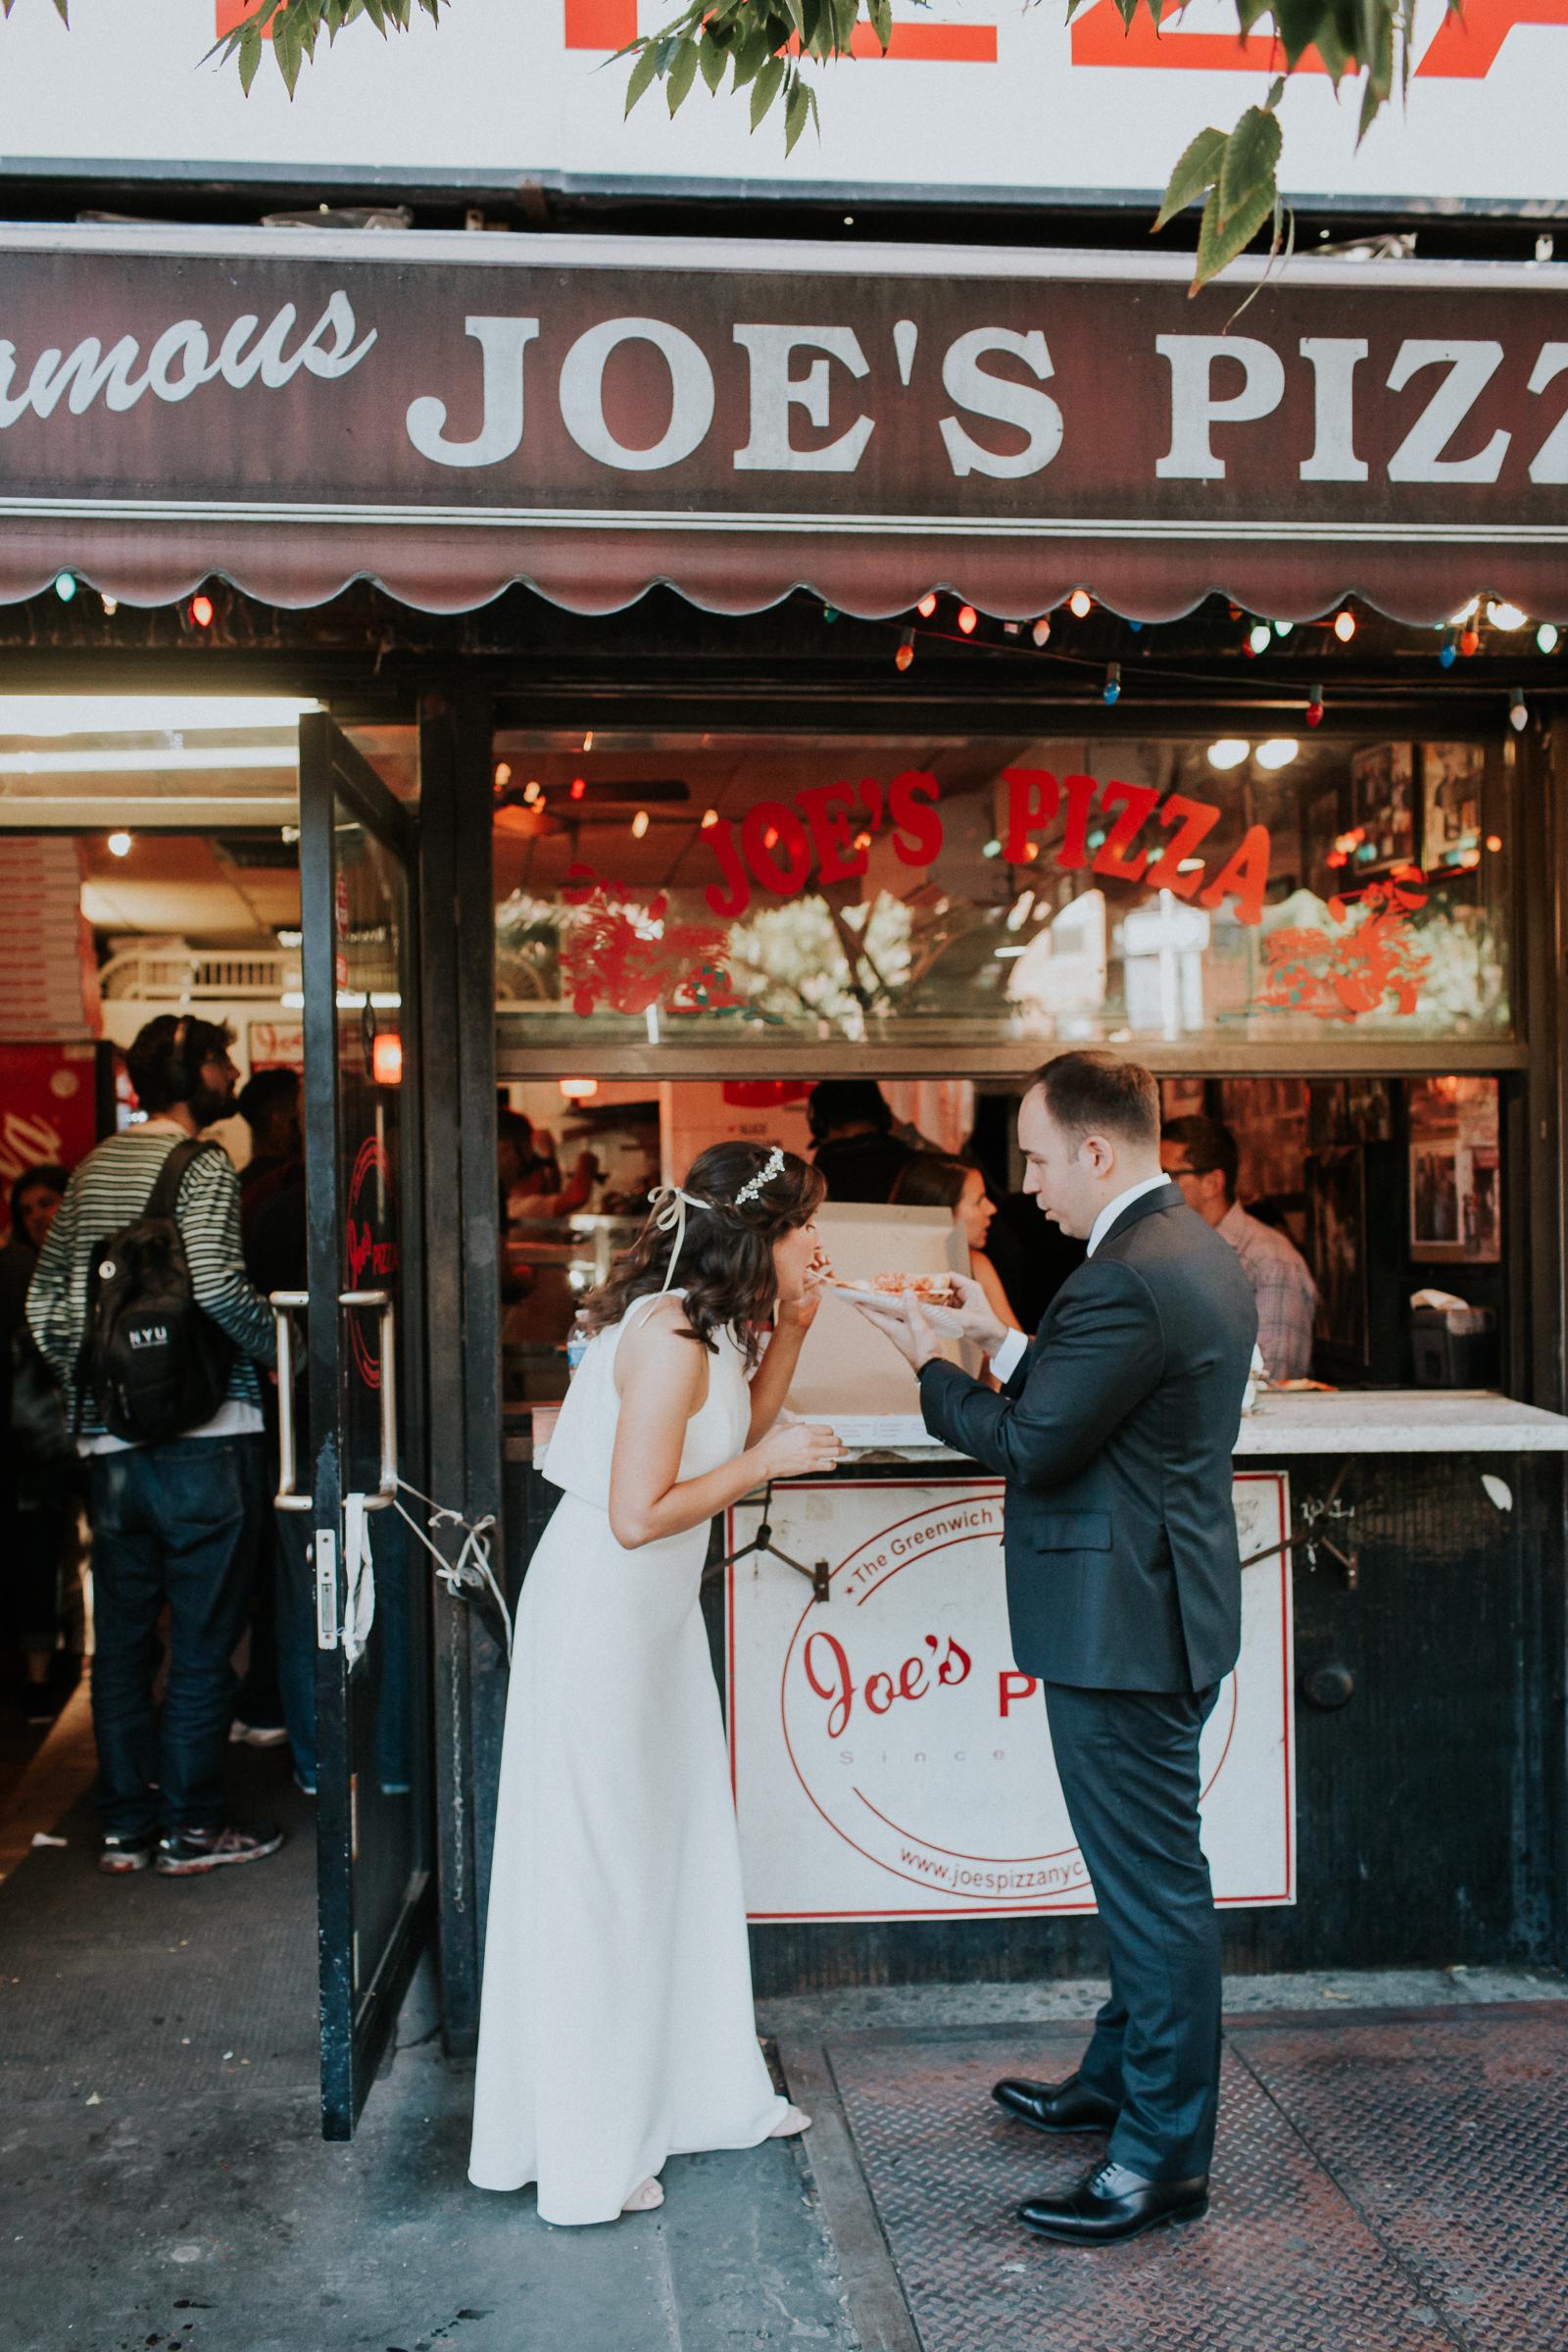 Casa-Apicii-Intimate-Wedding-City-Hall-Elopement-New-York-Documentary-Wedding-Photographer-39.jpg